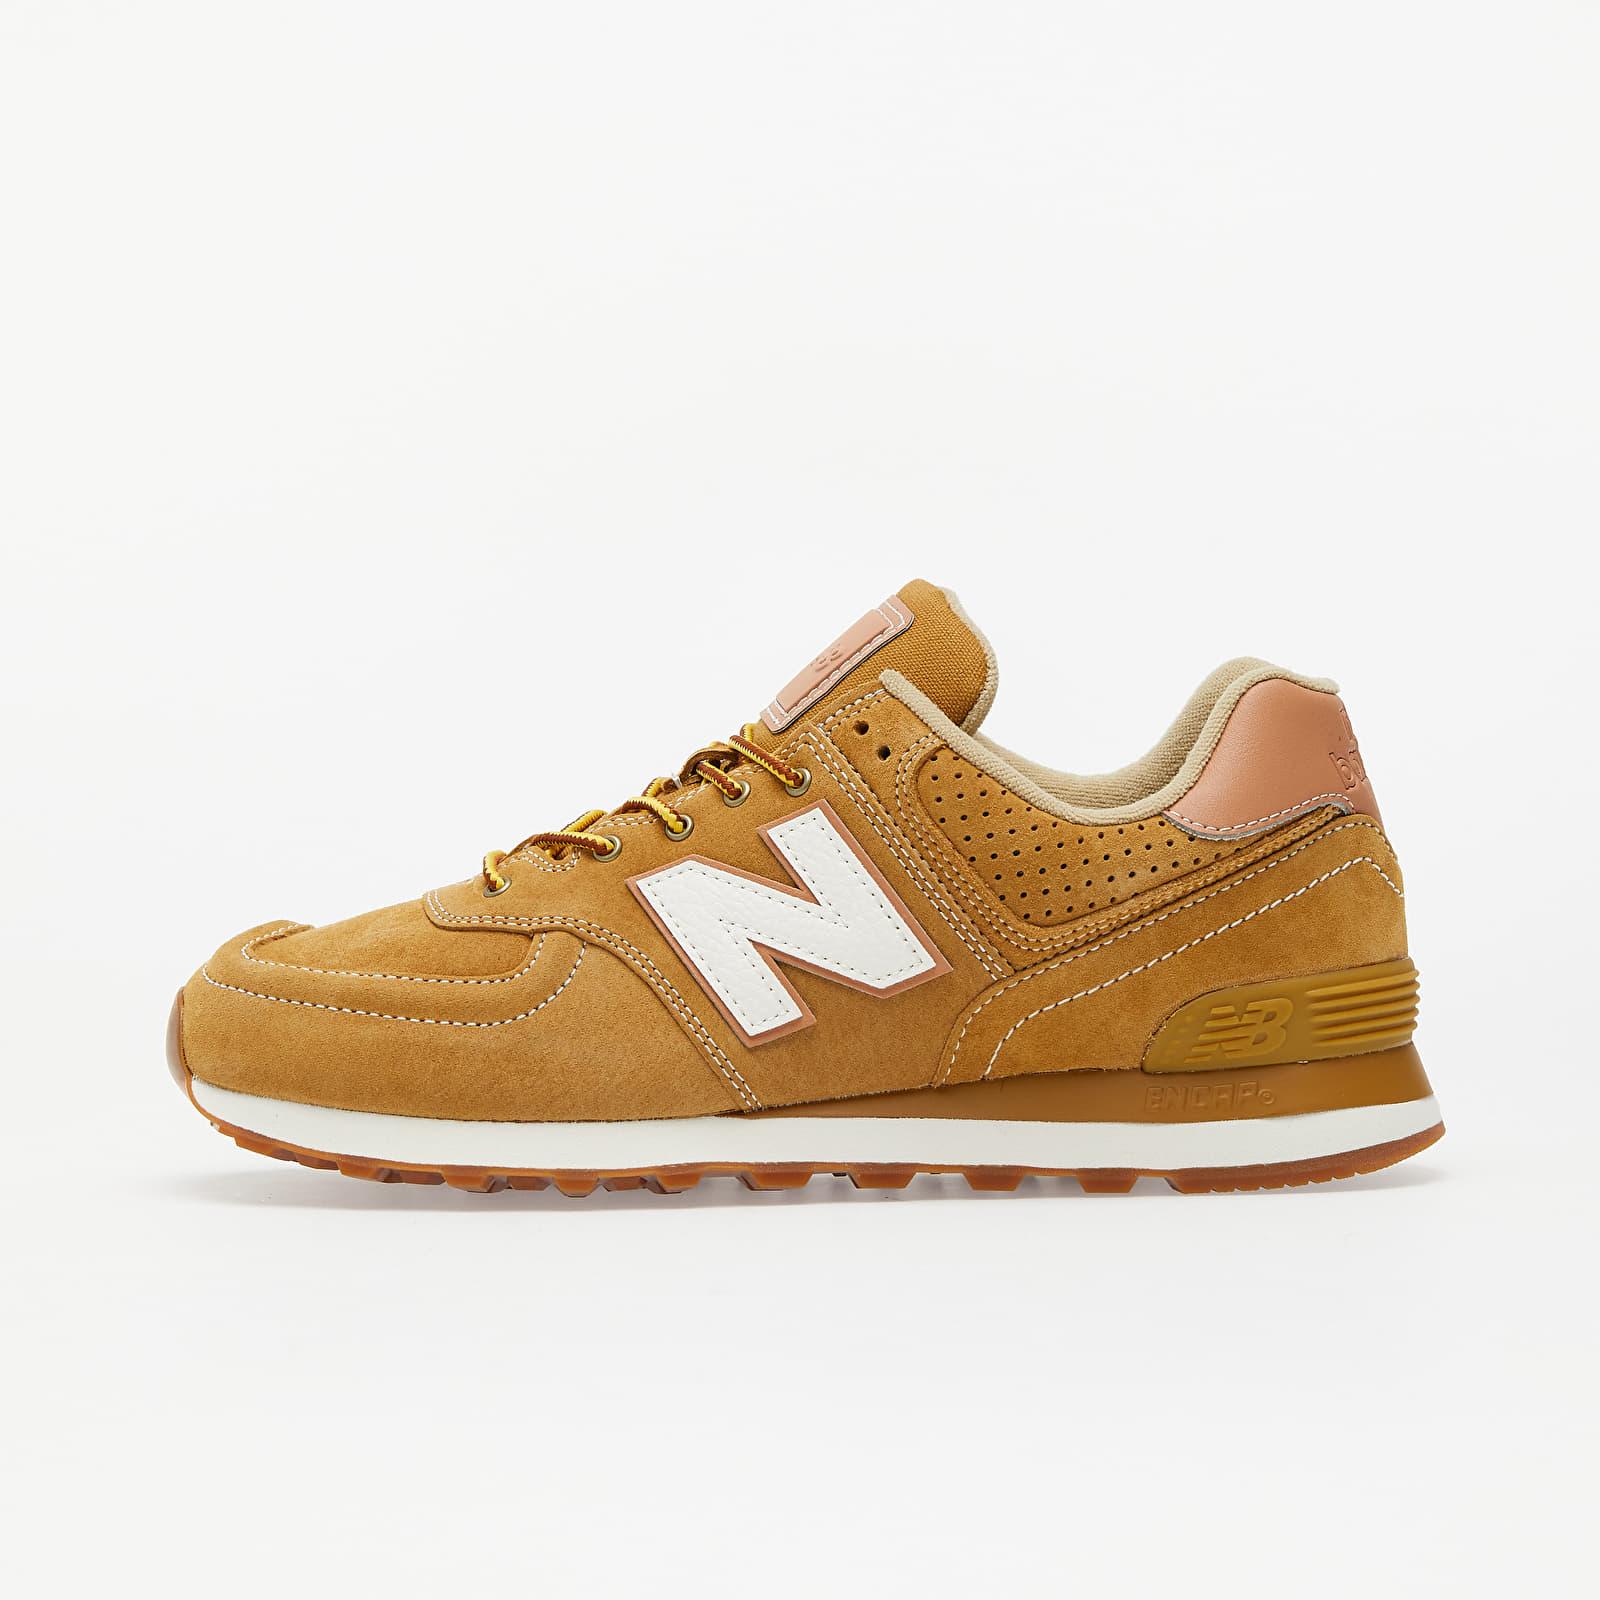 New Balance 574 Brown/ White ML574XAA